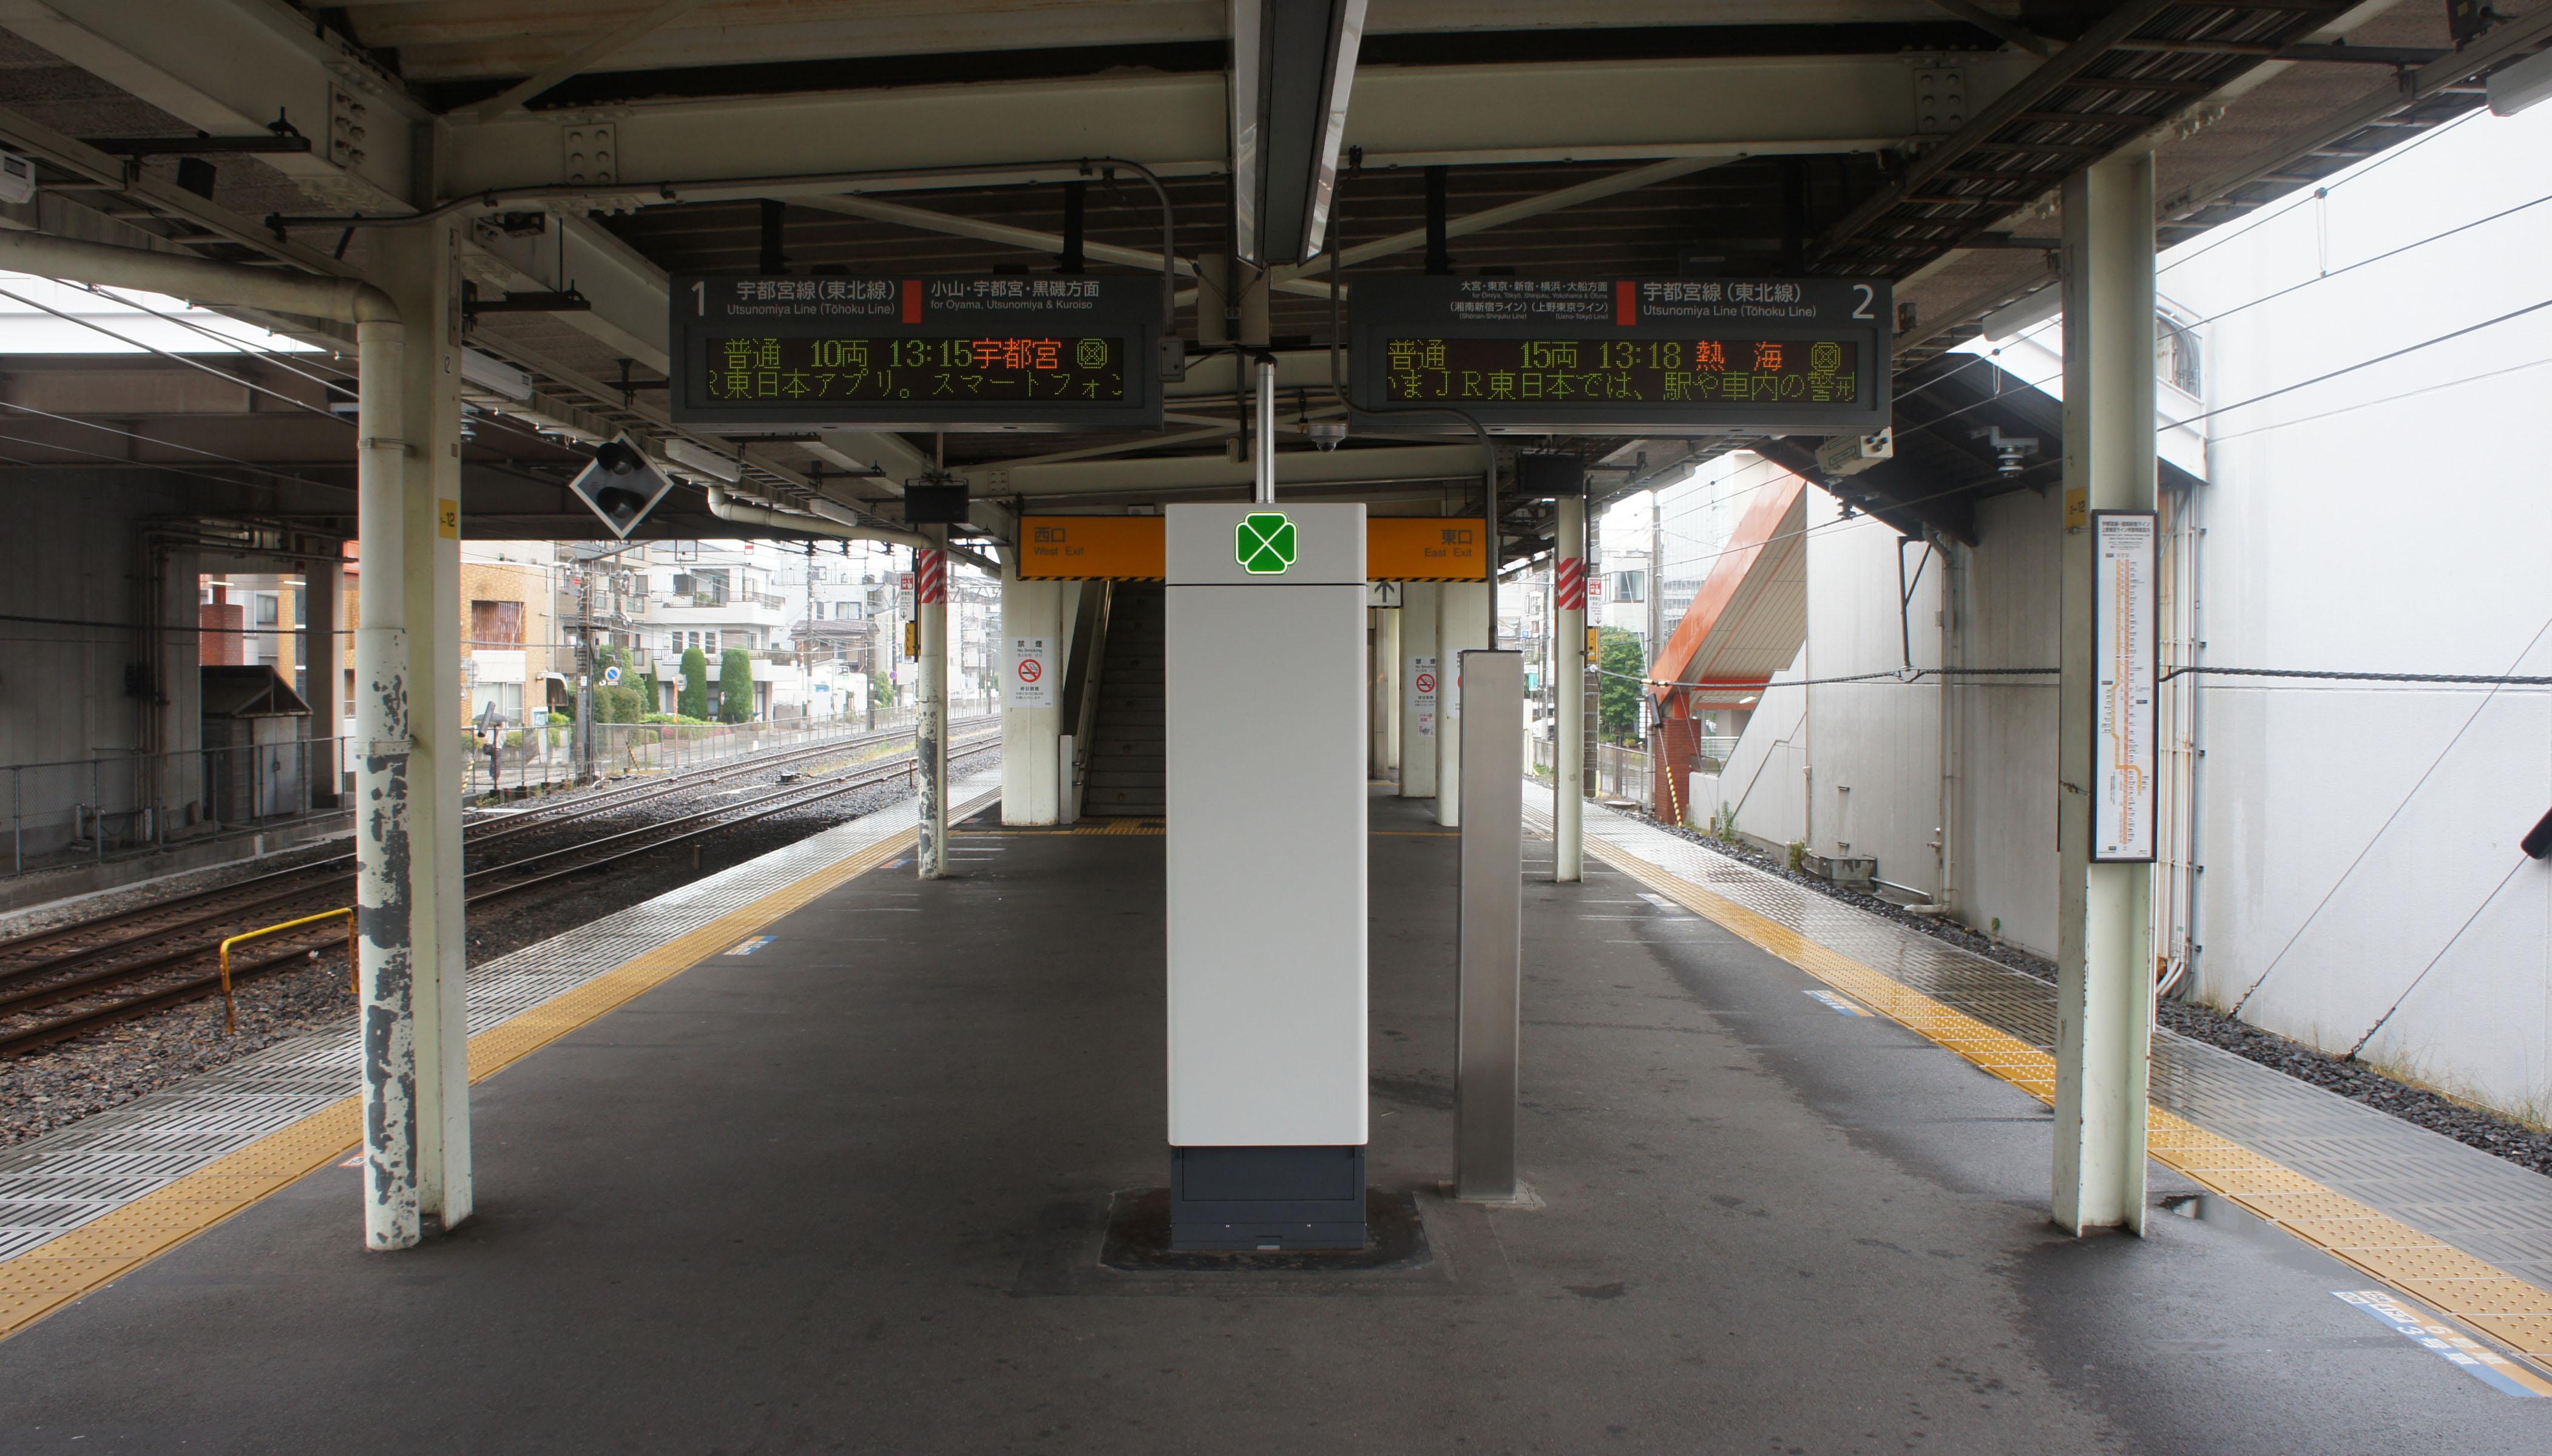 https://upload.wikimedia.org/wikipedia/commons/9/9c/JR_Tohoku-Main-Line_Toro_Station_Platform.jpg